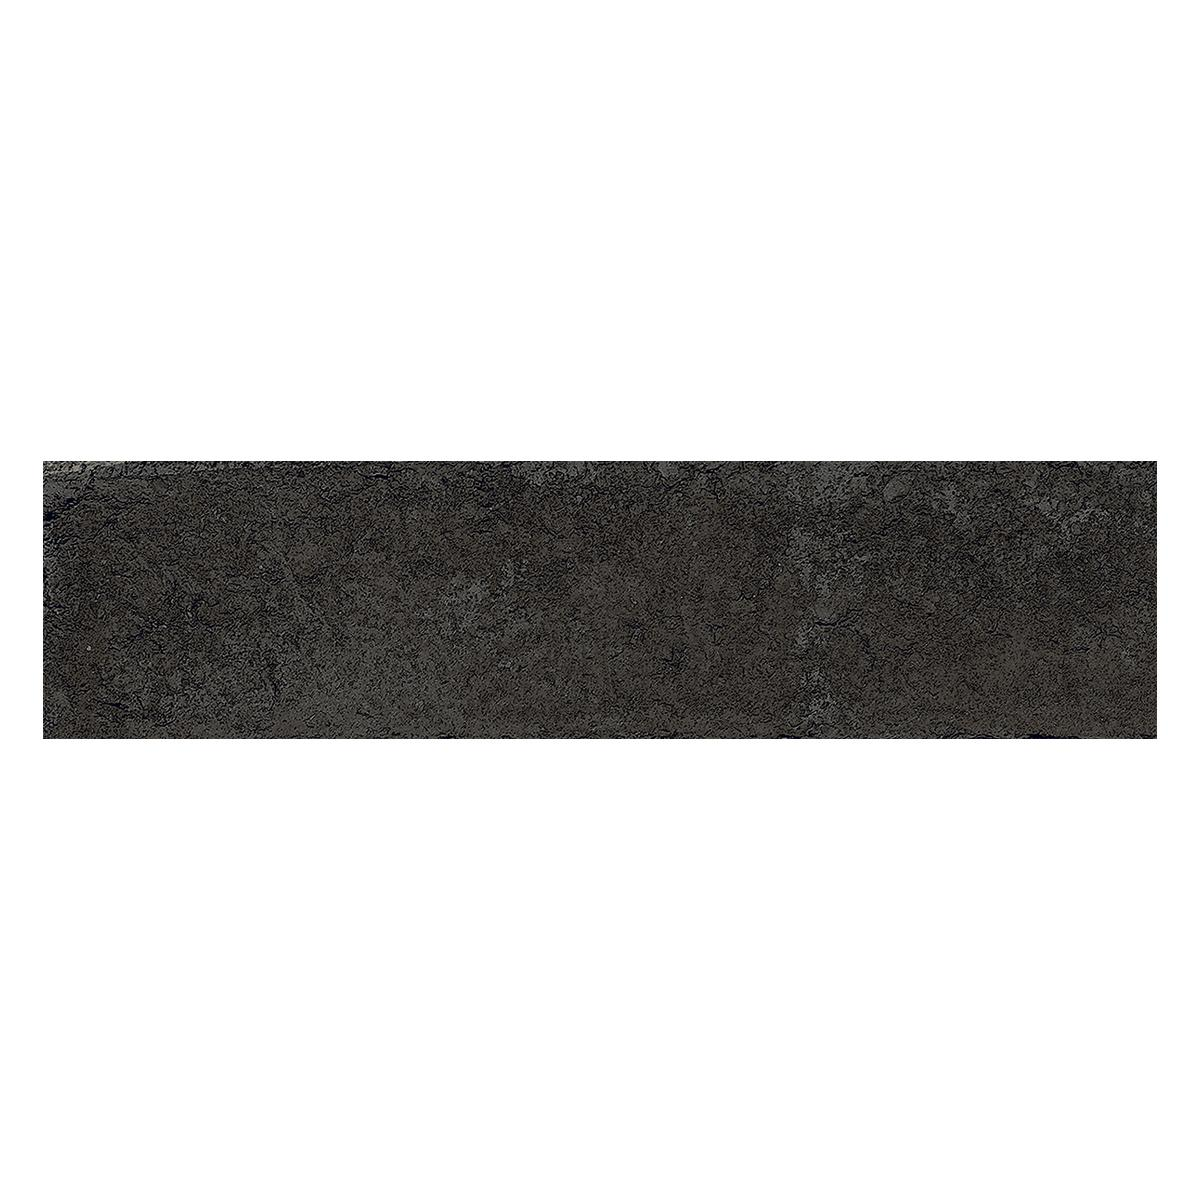 Mayólica Later Negro Mate - 7X35 cm - 0.73 m2